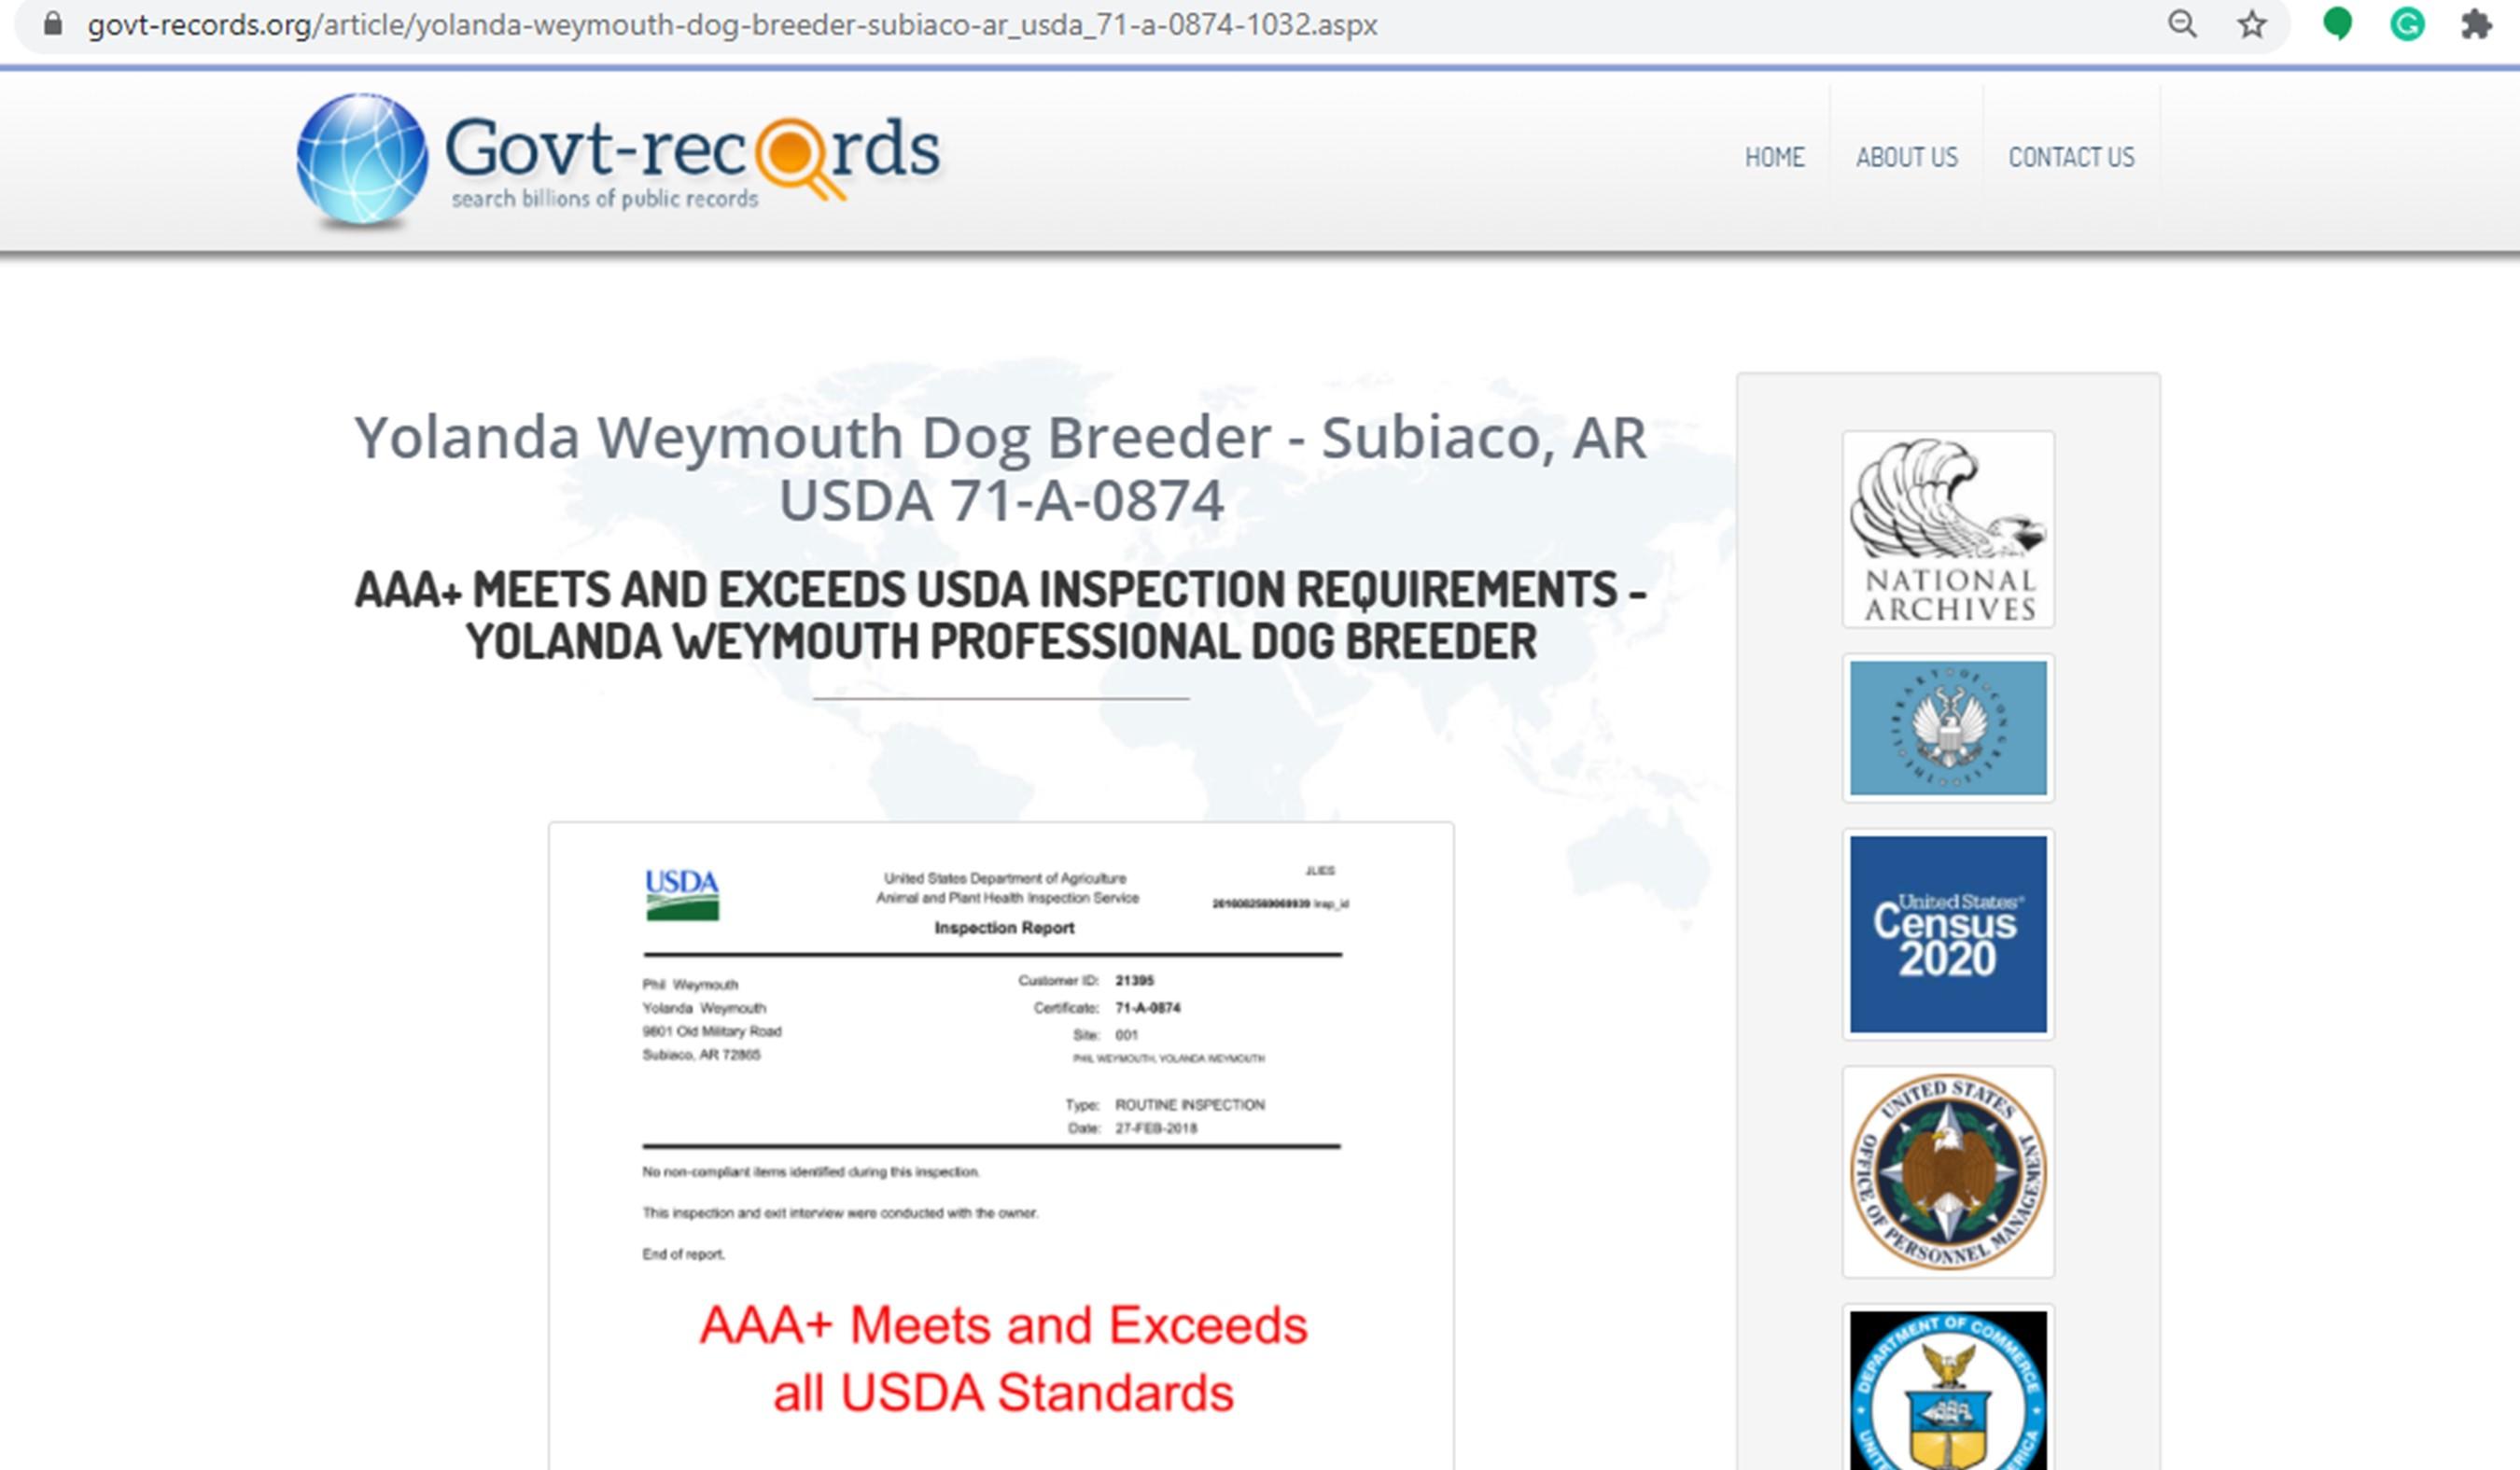 yolanda, weymouth, good, dog, breeder, phil, yolanda-weymouth, dog, breeder, subiaco, ar, arkansas, aphis, inspection, record, yorkshire, daschund, puppy, mill, puppymill, usda, 71-a-0874, 71a0874, inspection, records, kennel